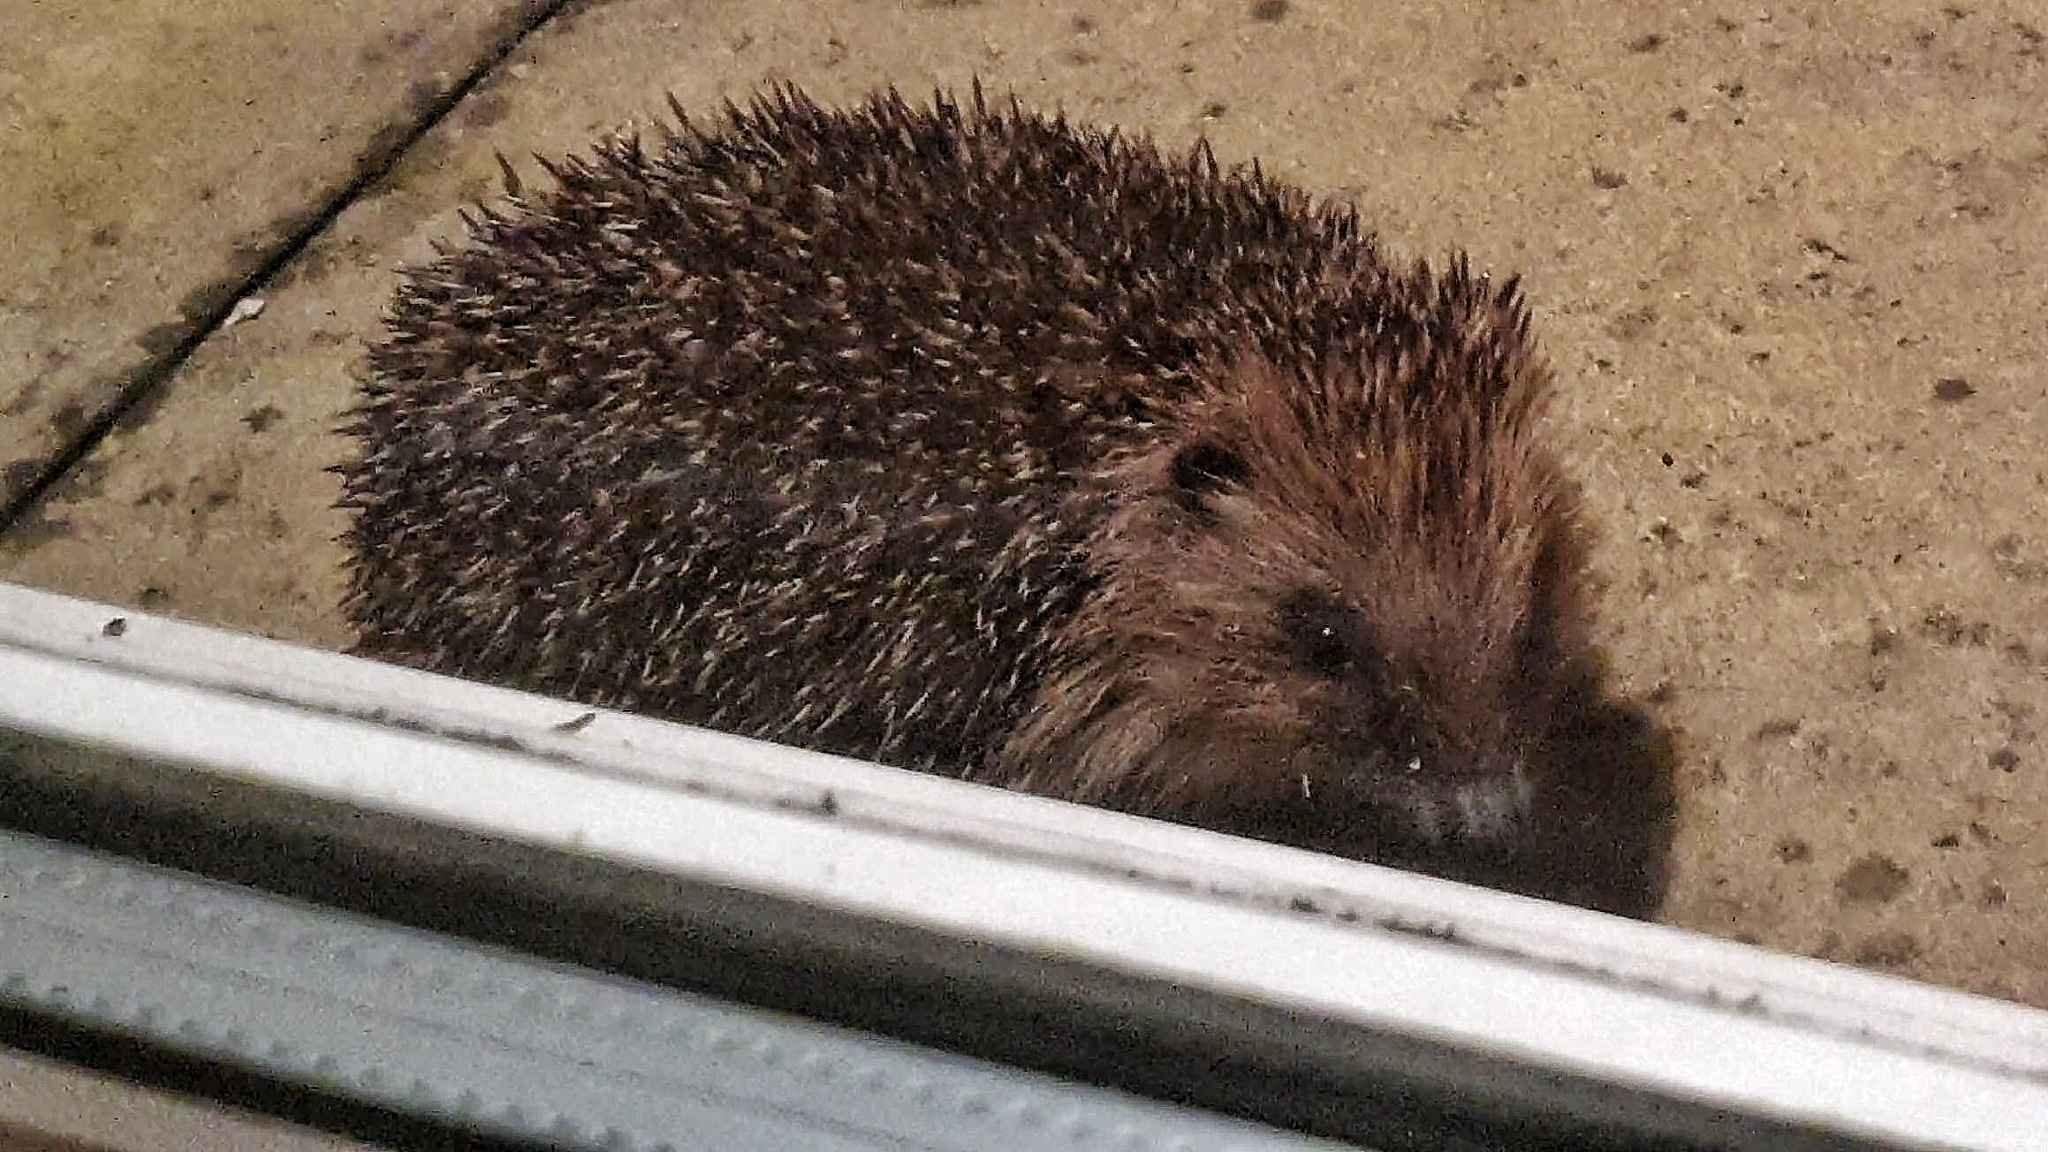 Hedgehog by Chris JK